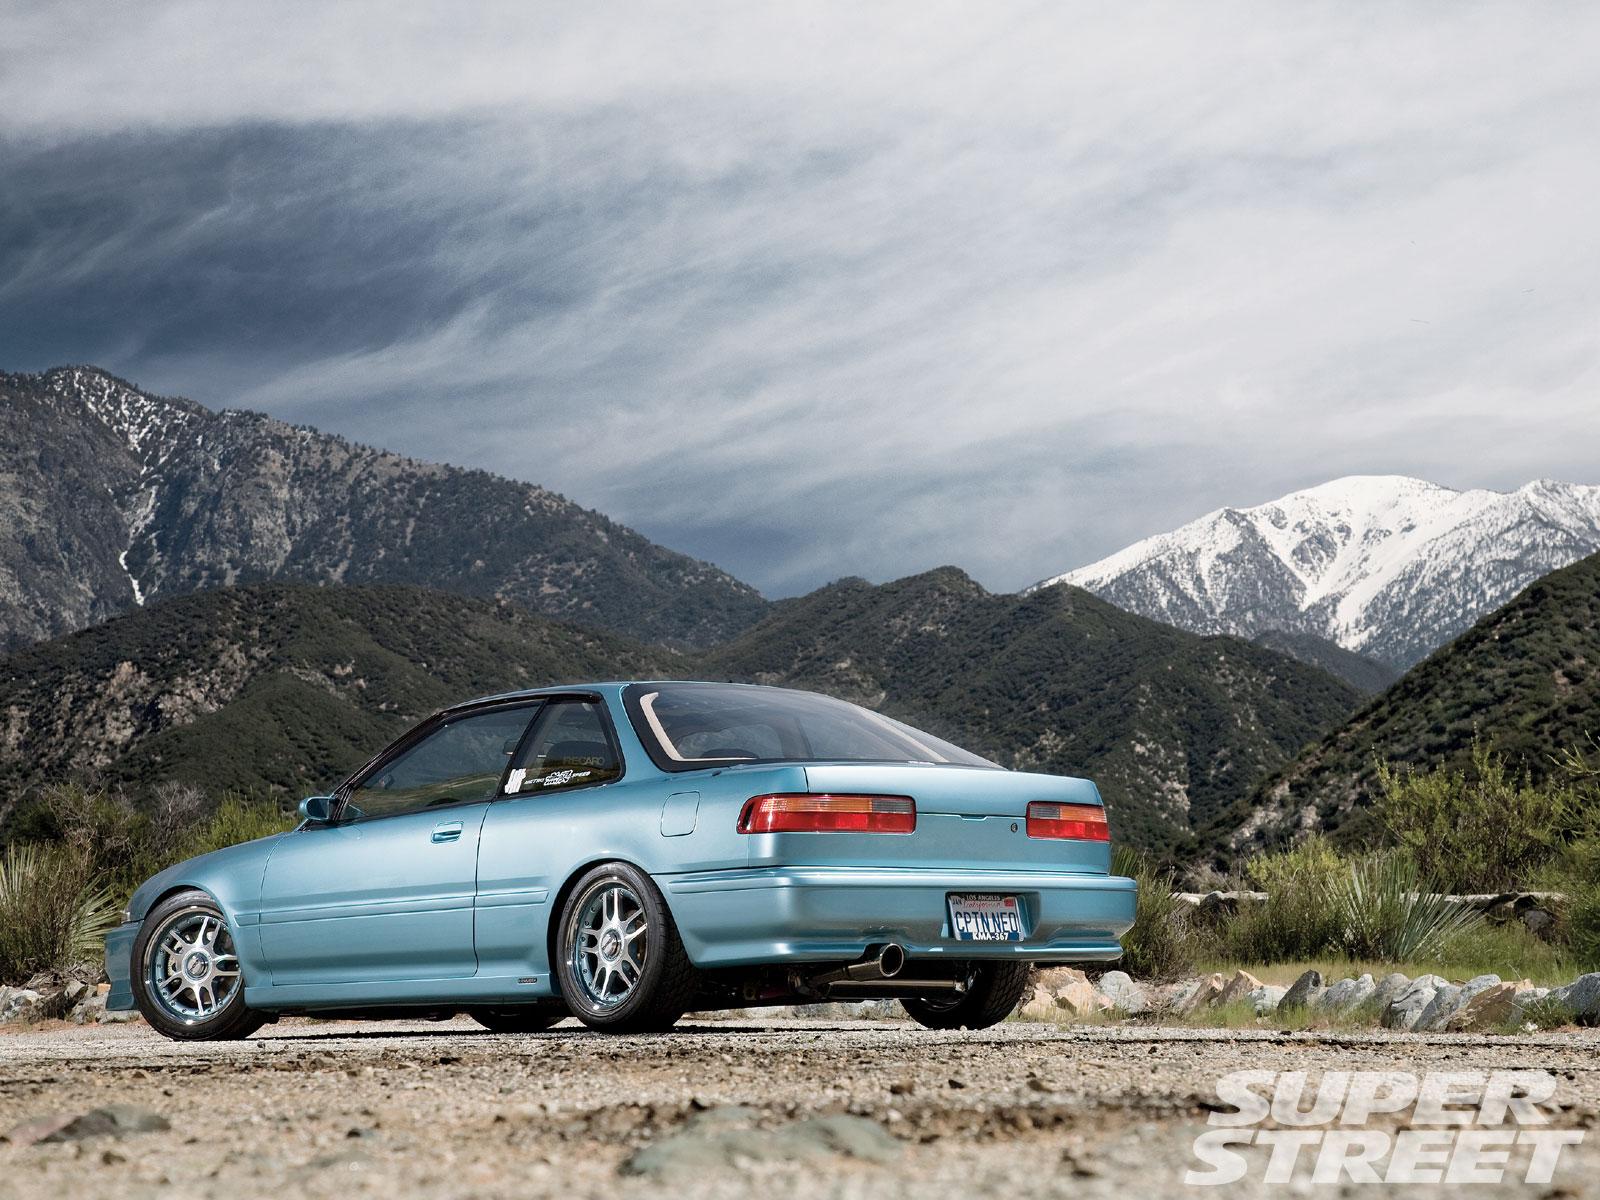 1991 Acura Integra Image 9